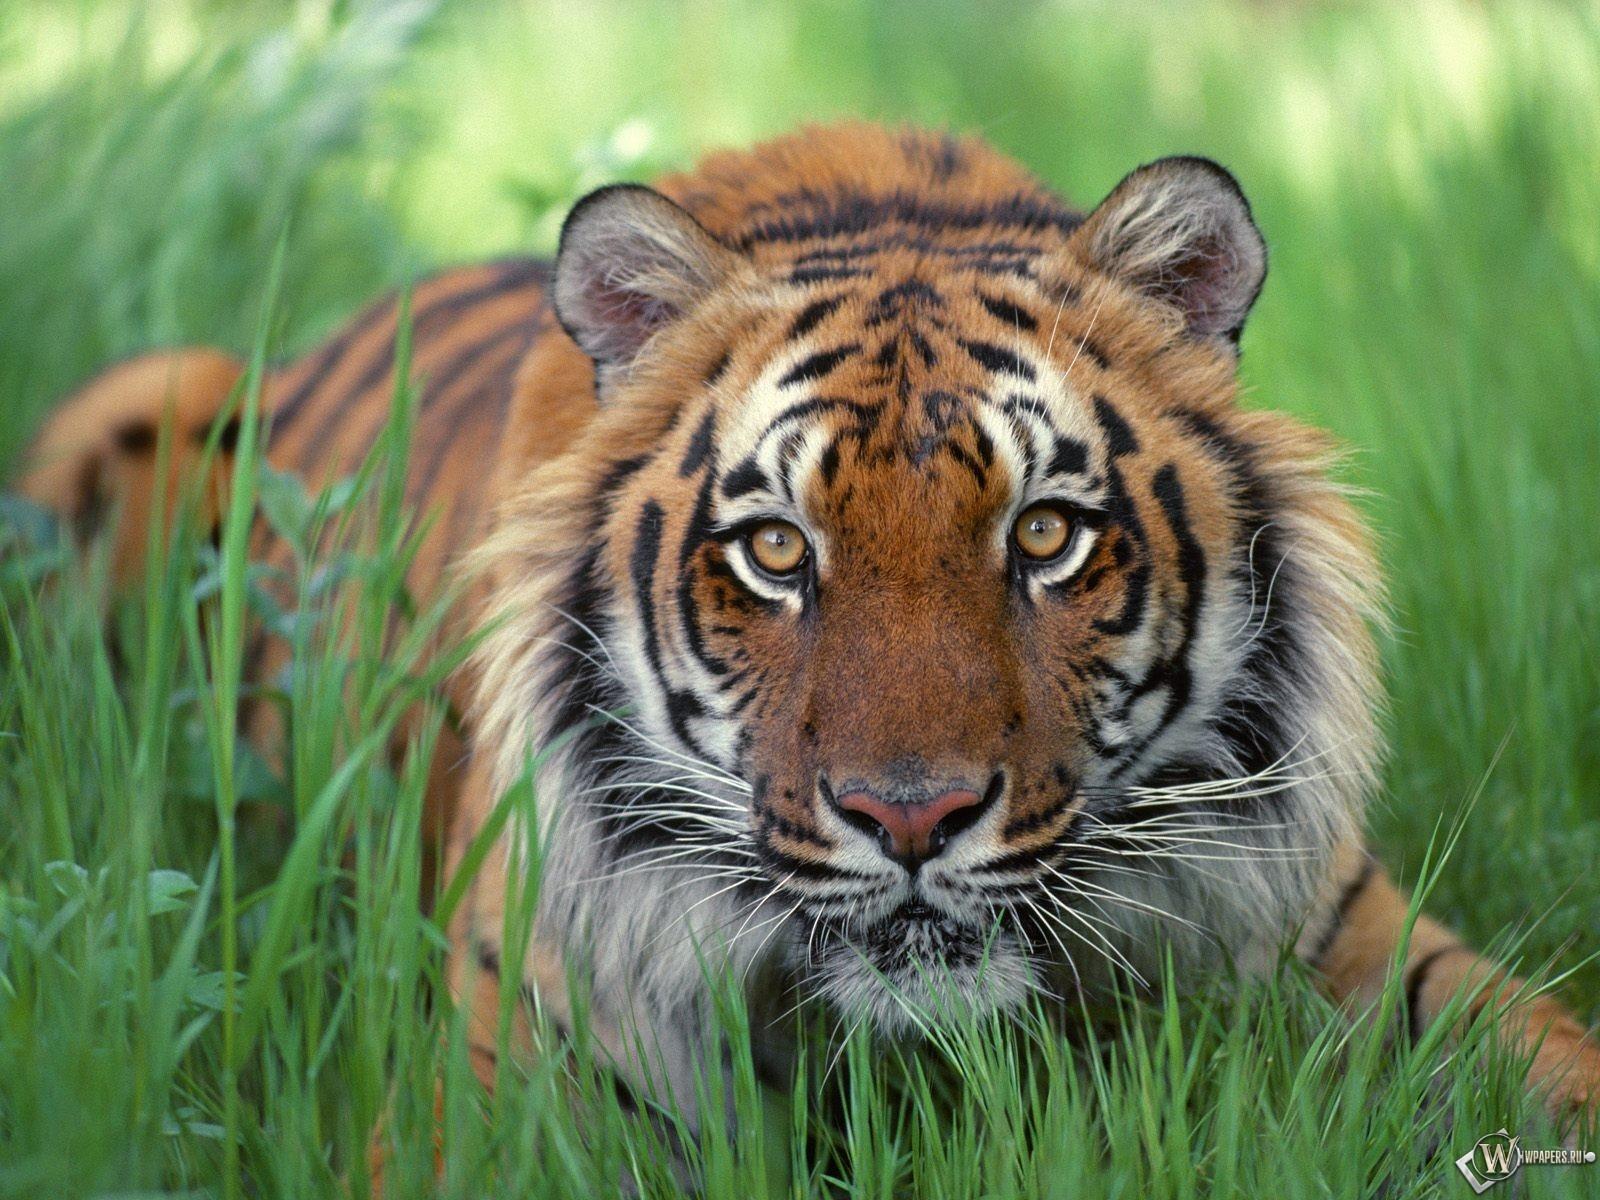 Тигр в травке 1600x1200